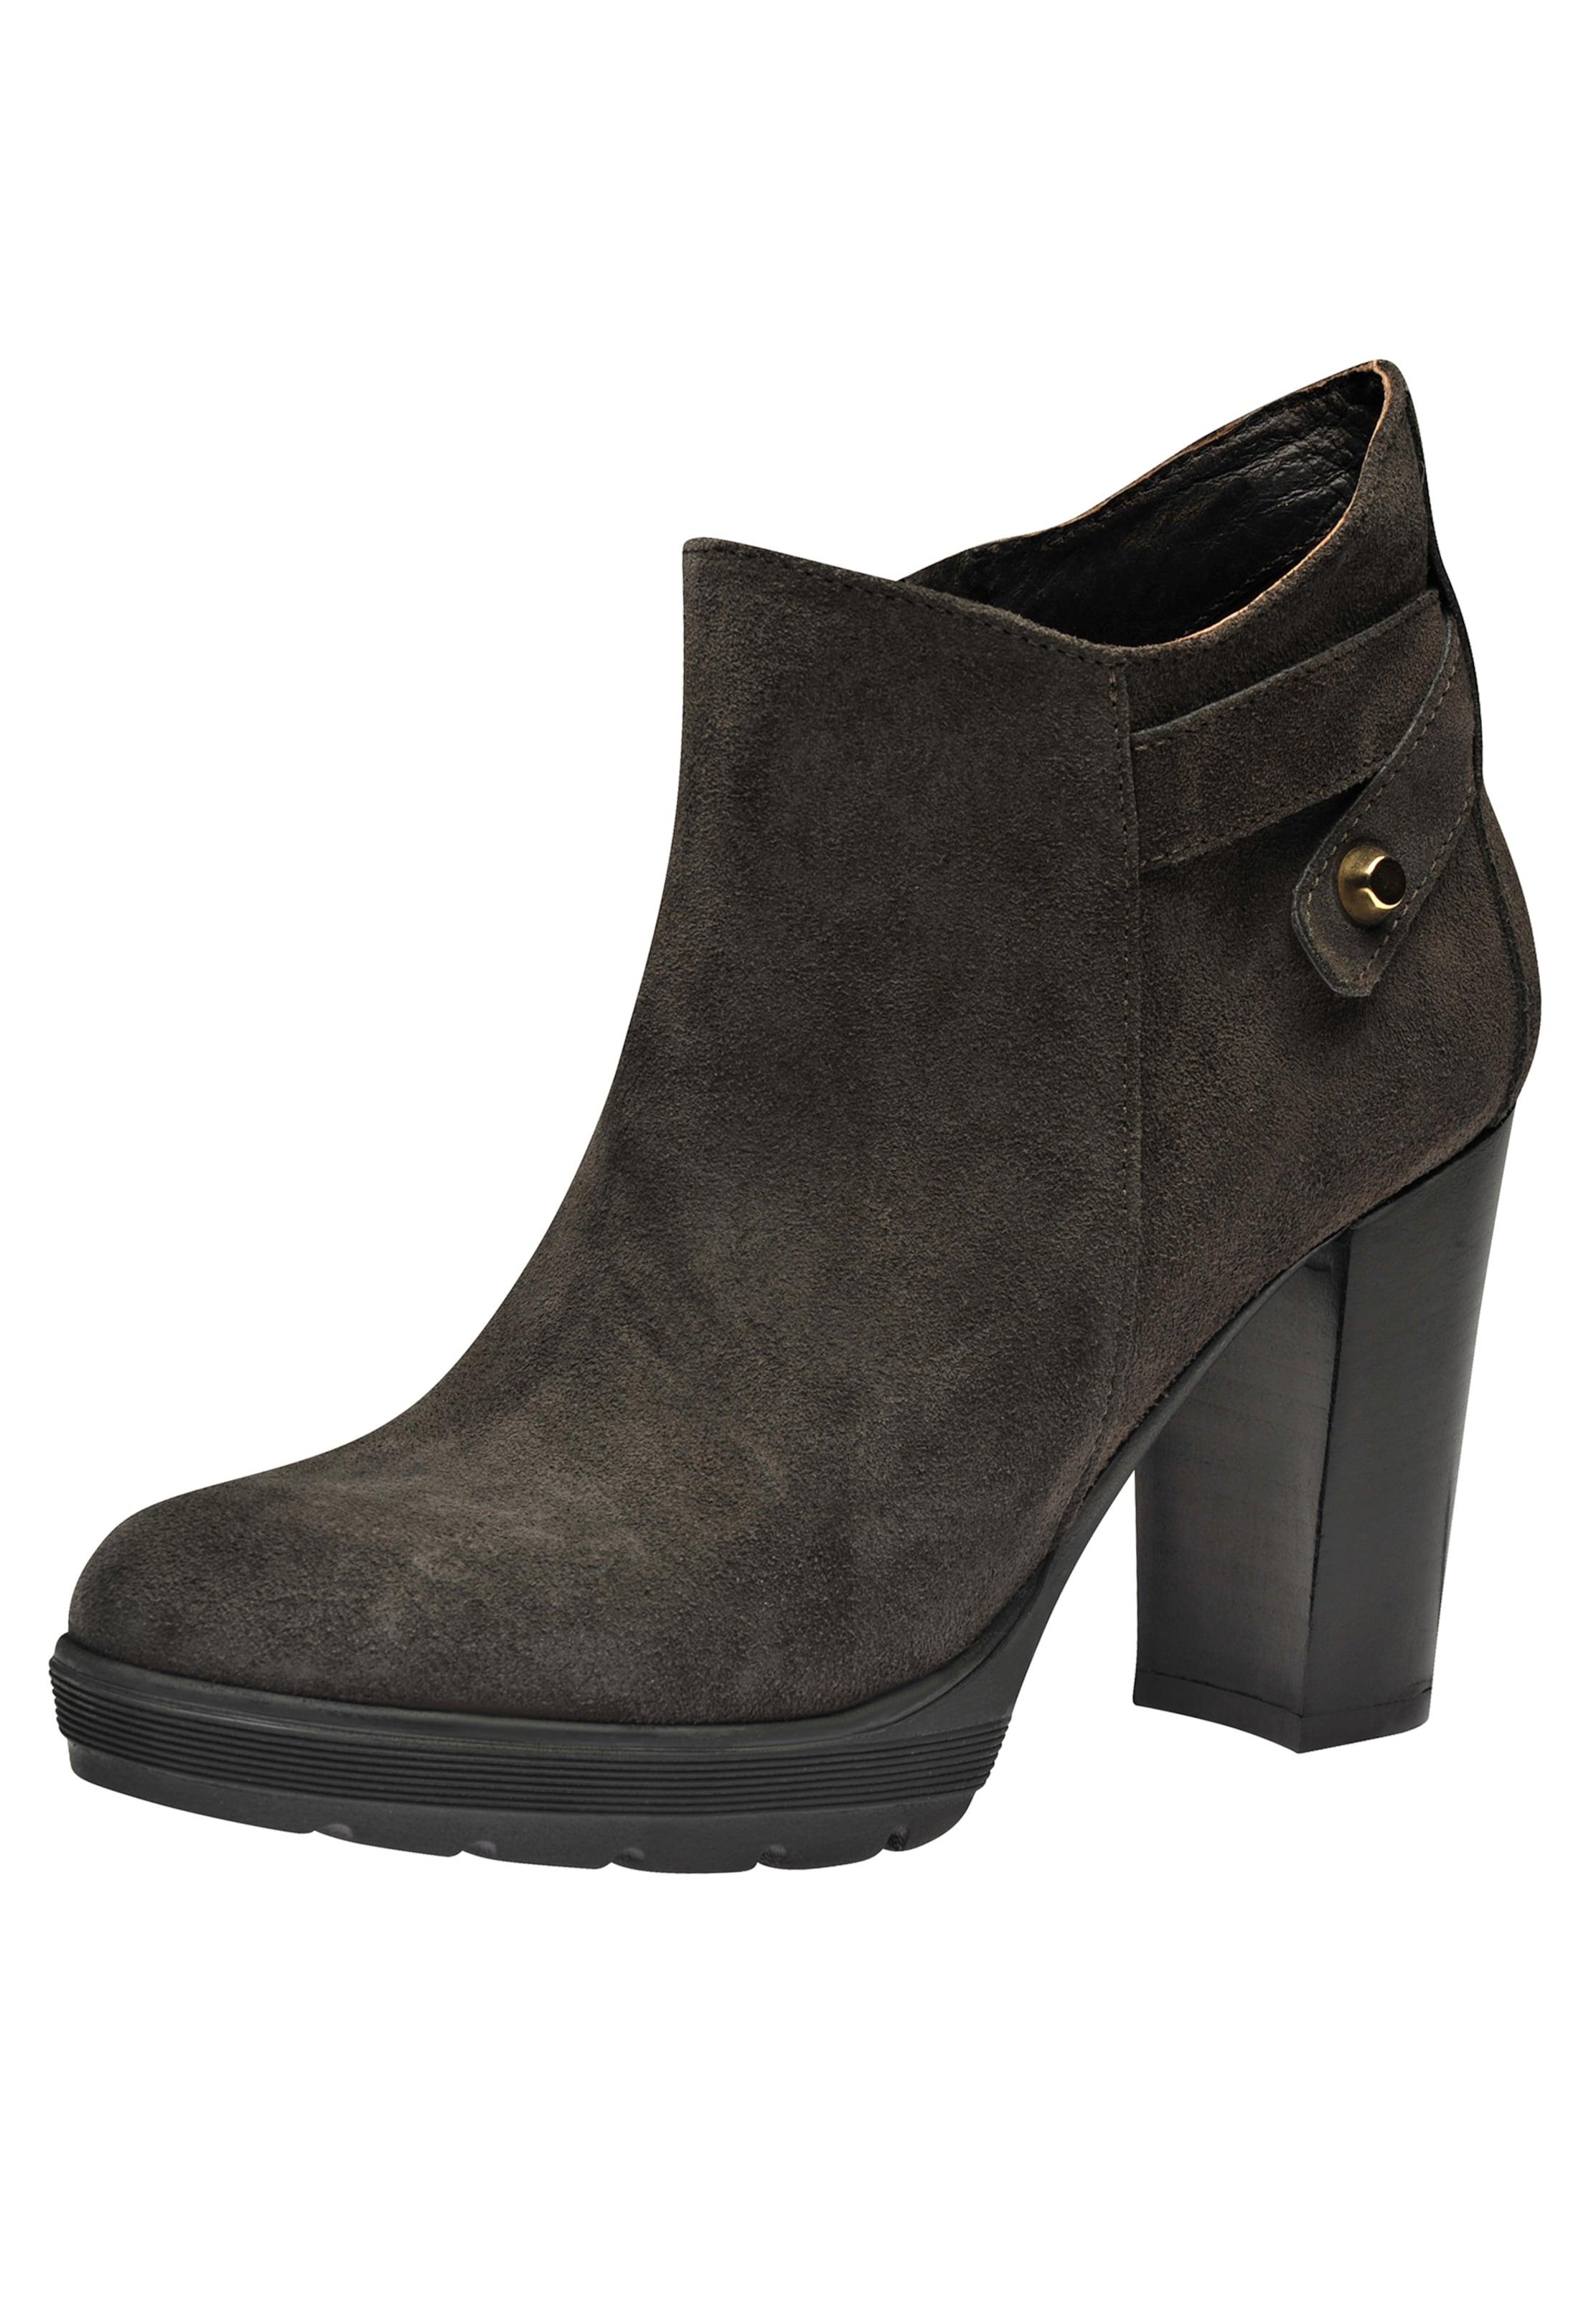 Haltbare Mode billige Schuhe EVITA | Damen Stiefelette Schuhe Schuhe Schuhe Gut getragene Schuhe 79e51d